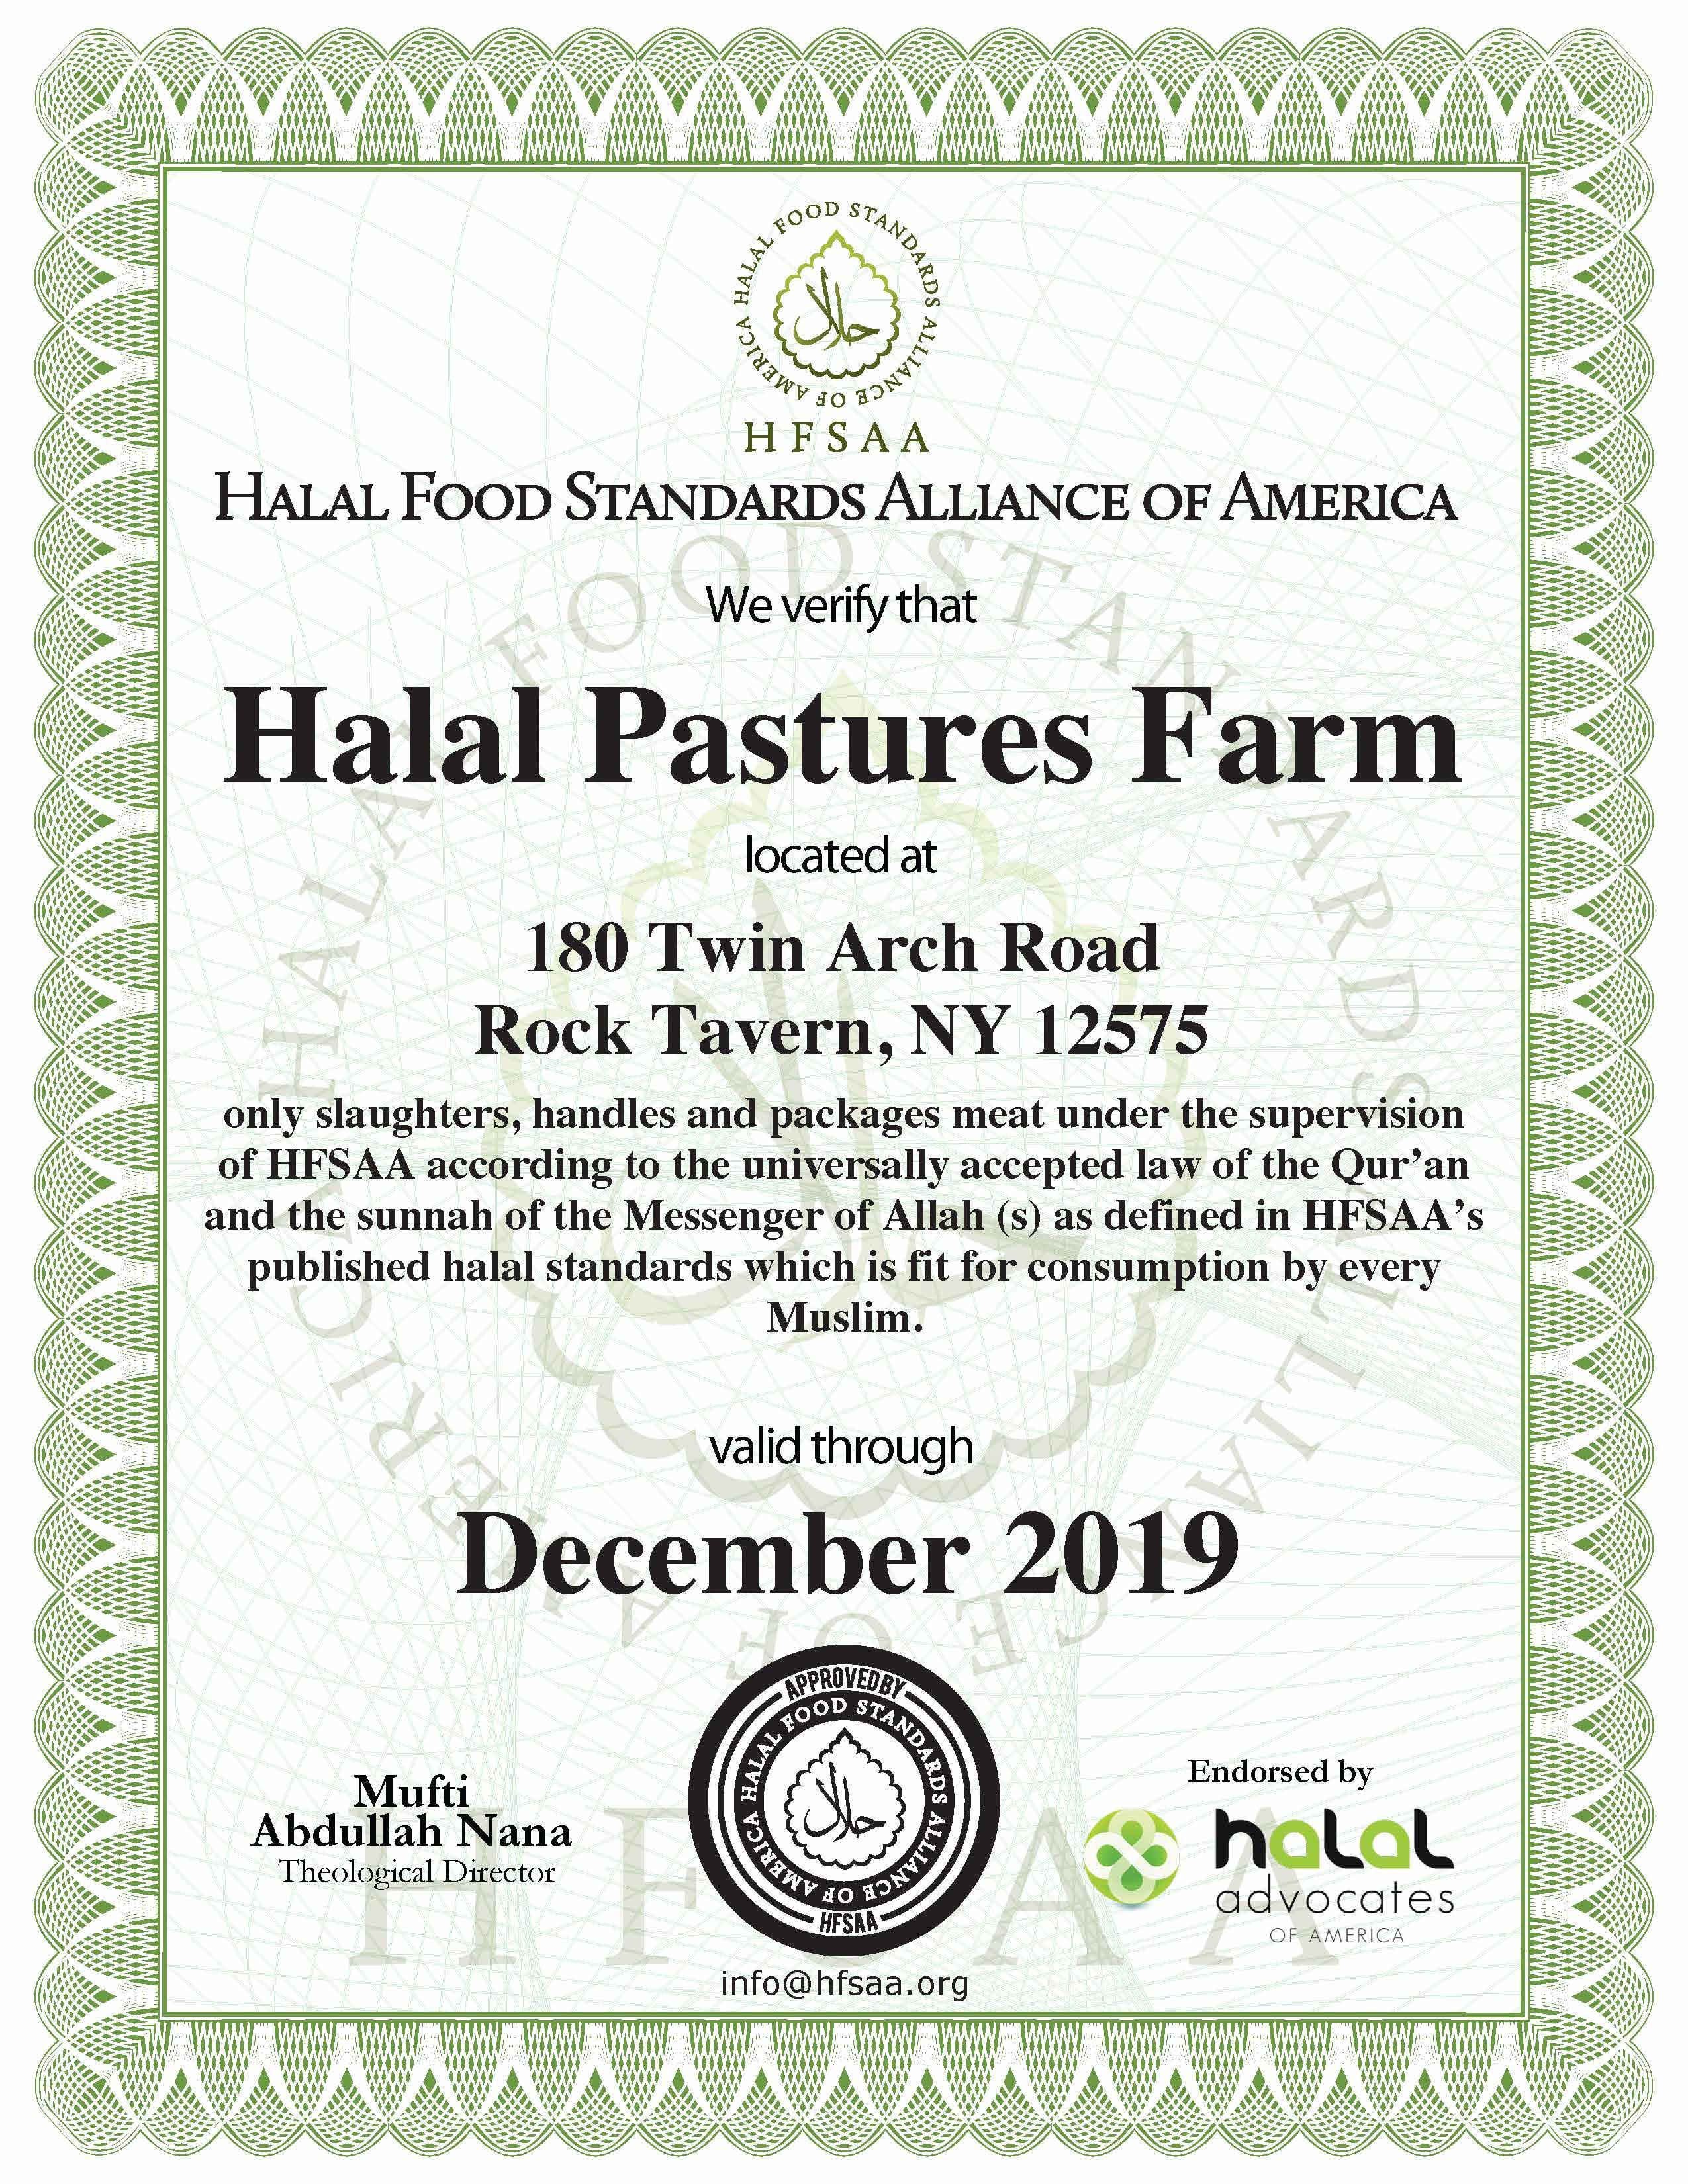 halal-pastures-farm-2019-certificate.jpg